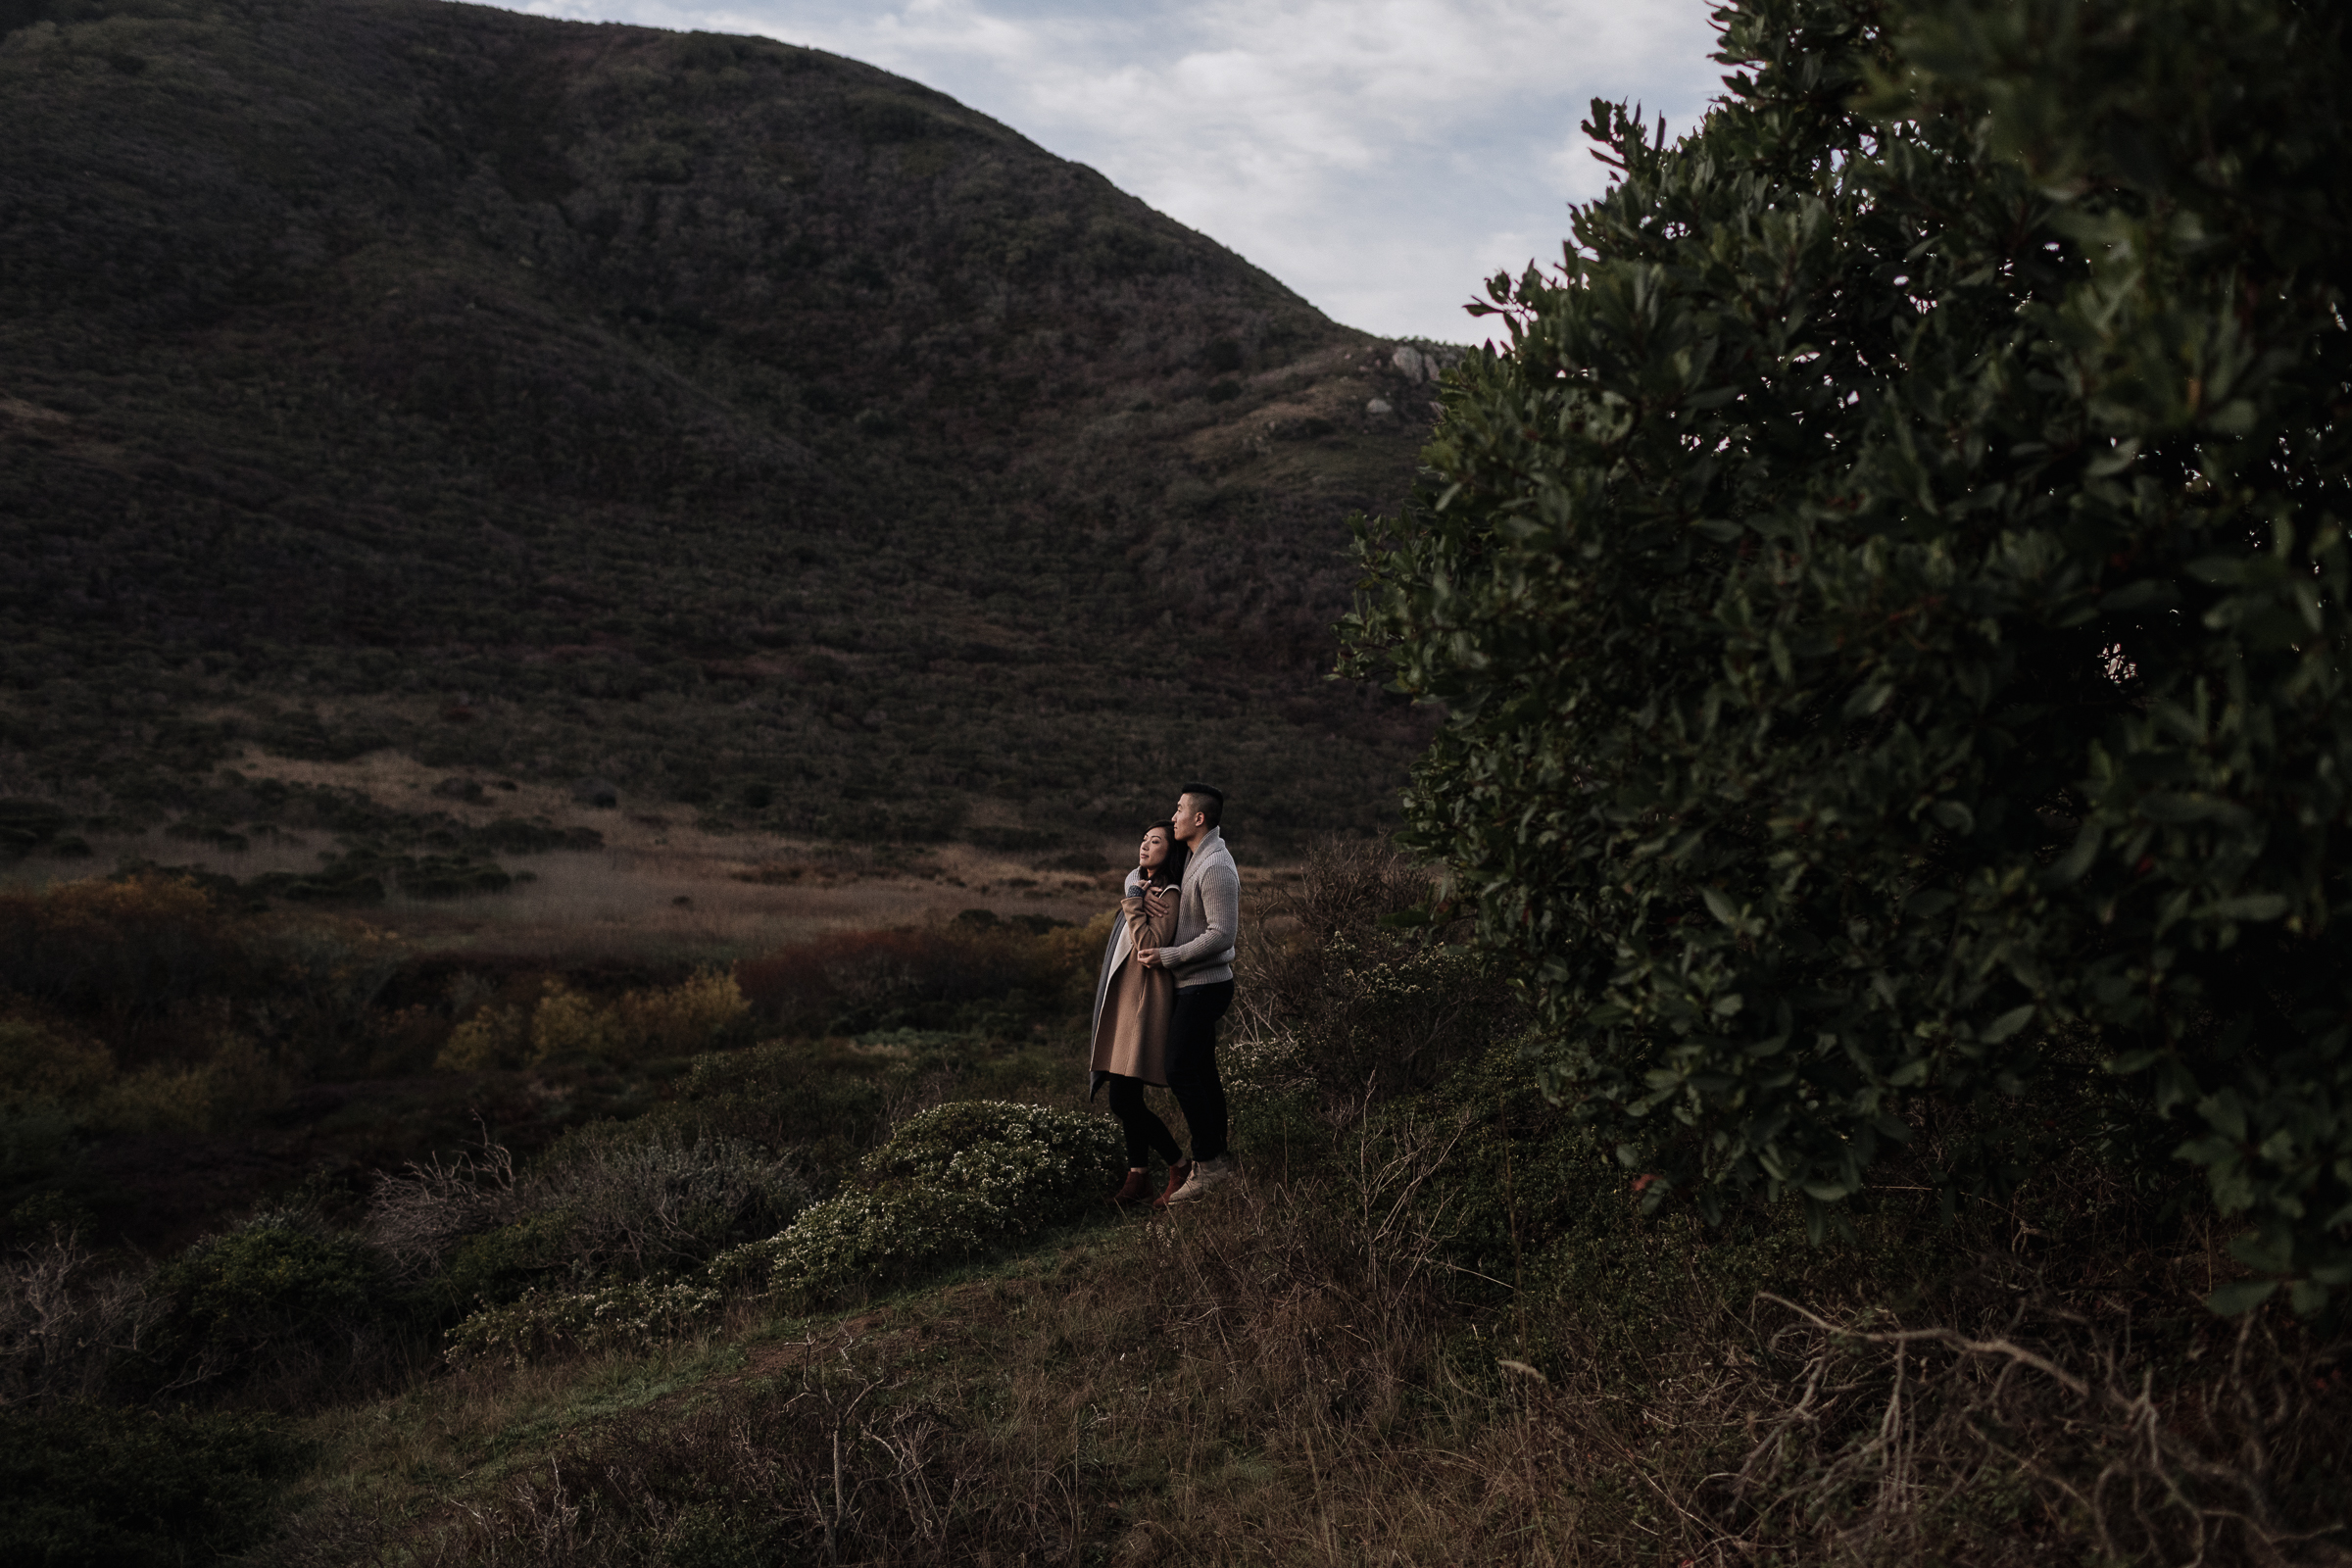 gretchen_gause_tennessee_valley_trail_engagement_photo_california-20.jpg